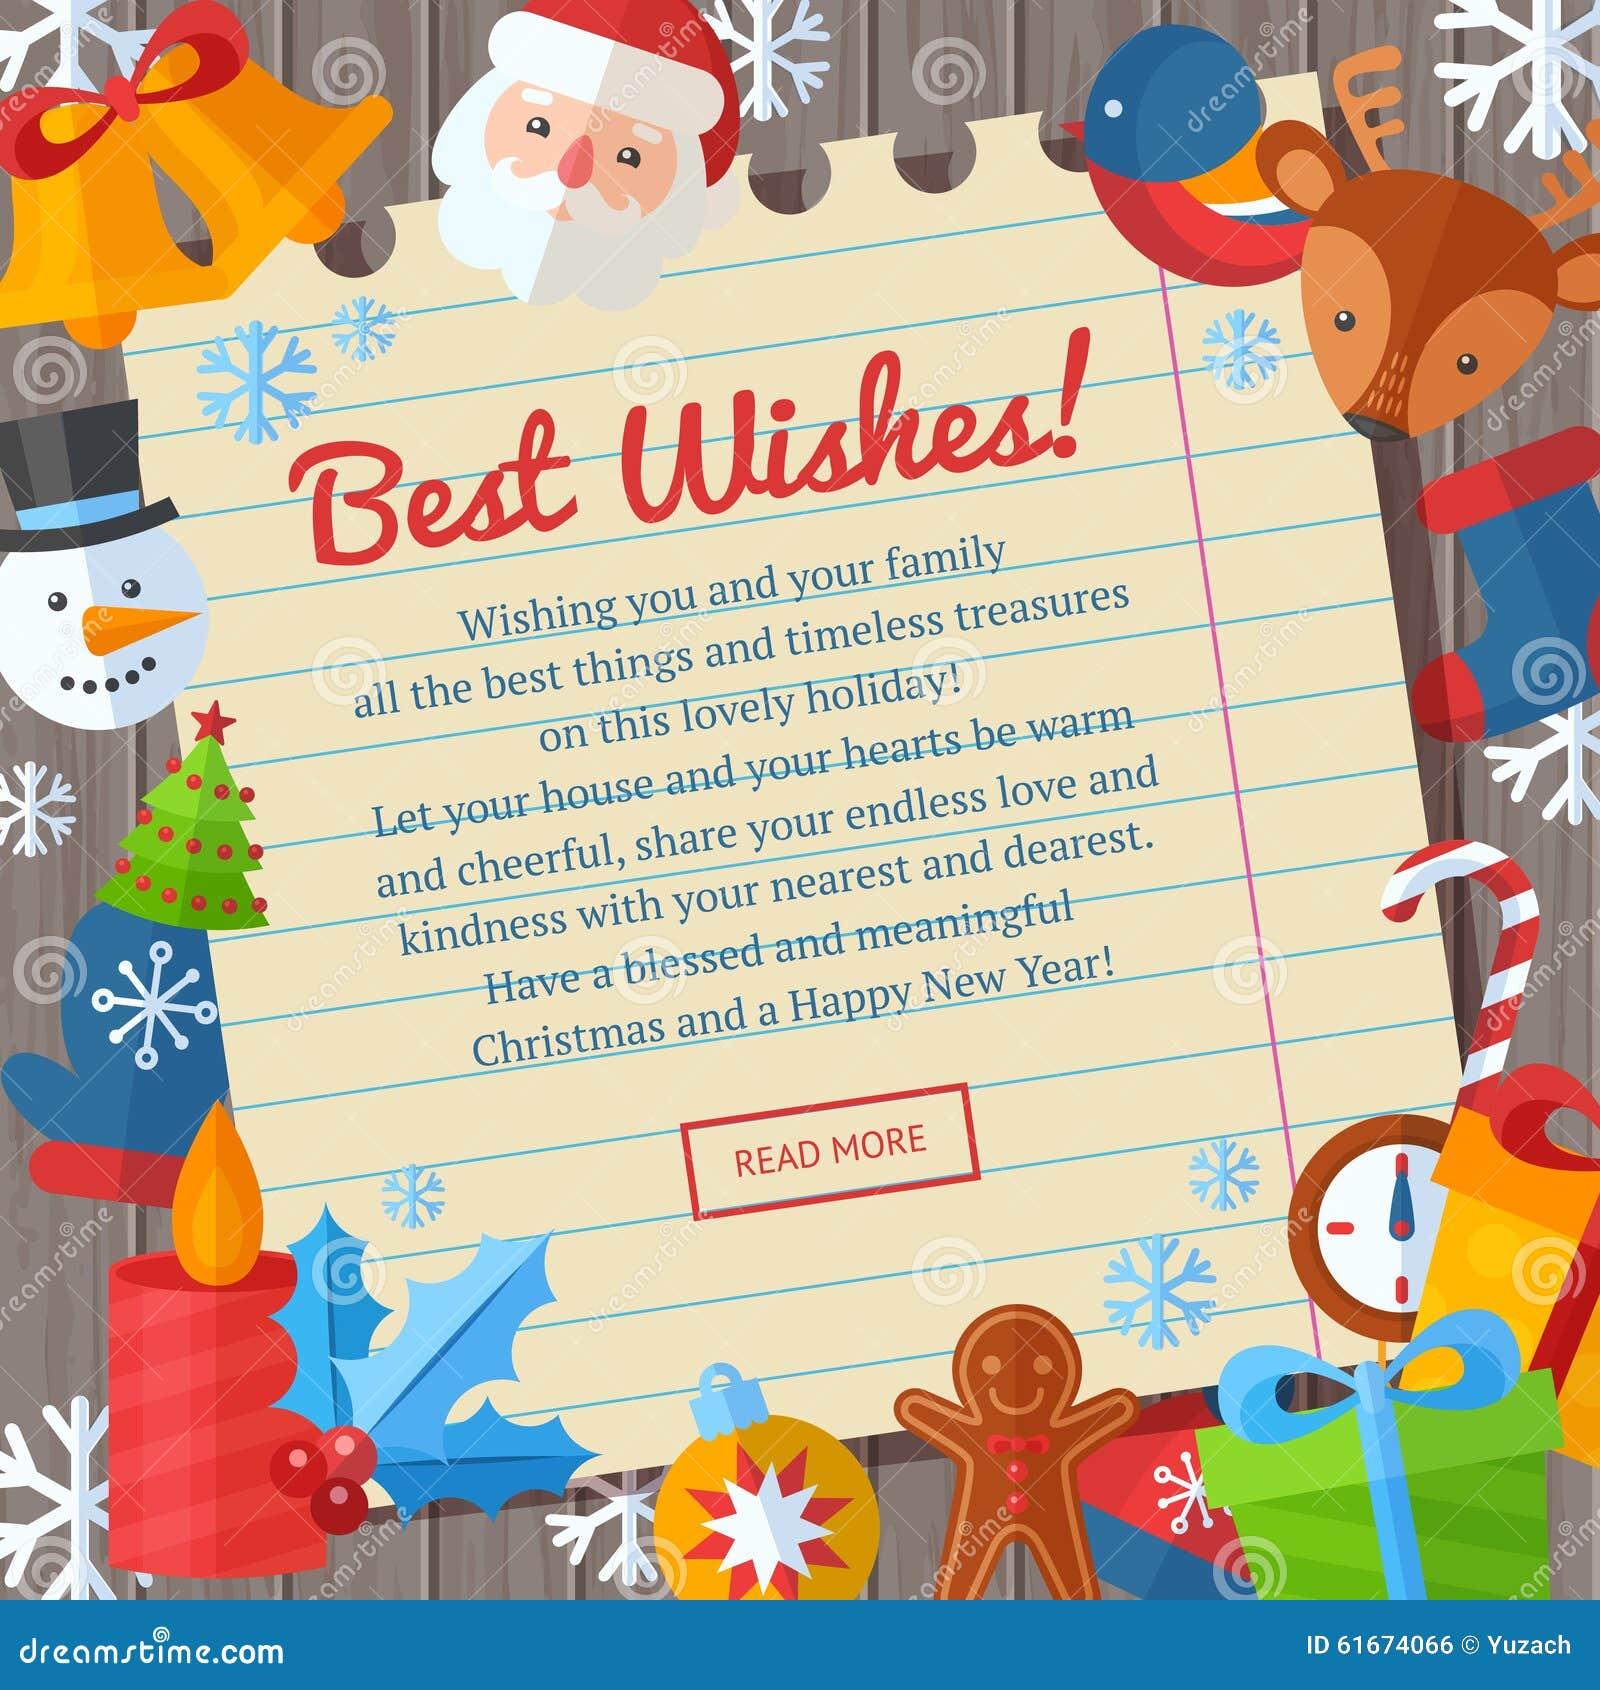 Christmas Flat Greeting Cards And Banners Santa Deer Xmas Tree